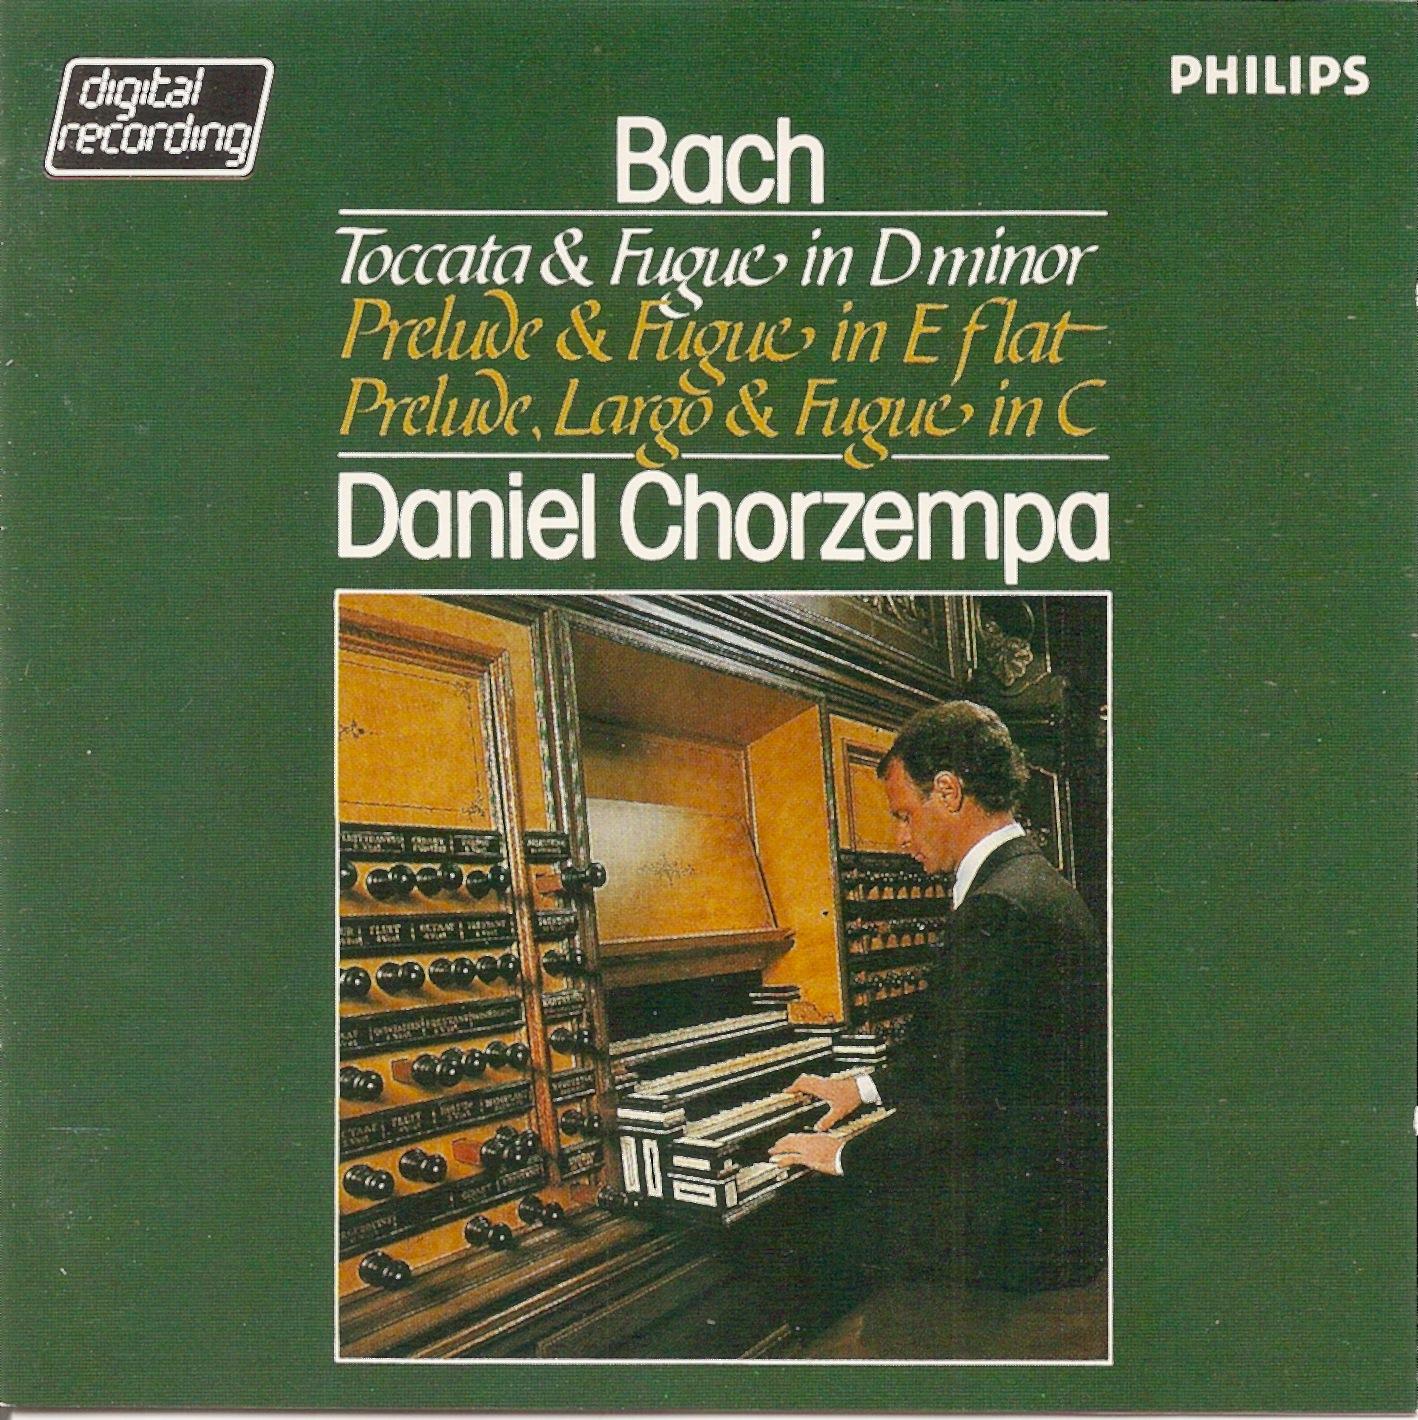 Passacaglia and Fugue, for organ in C minor, BWV 582 (BC J79)